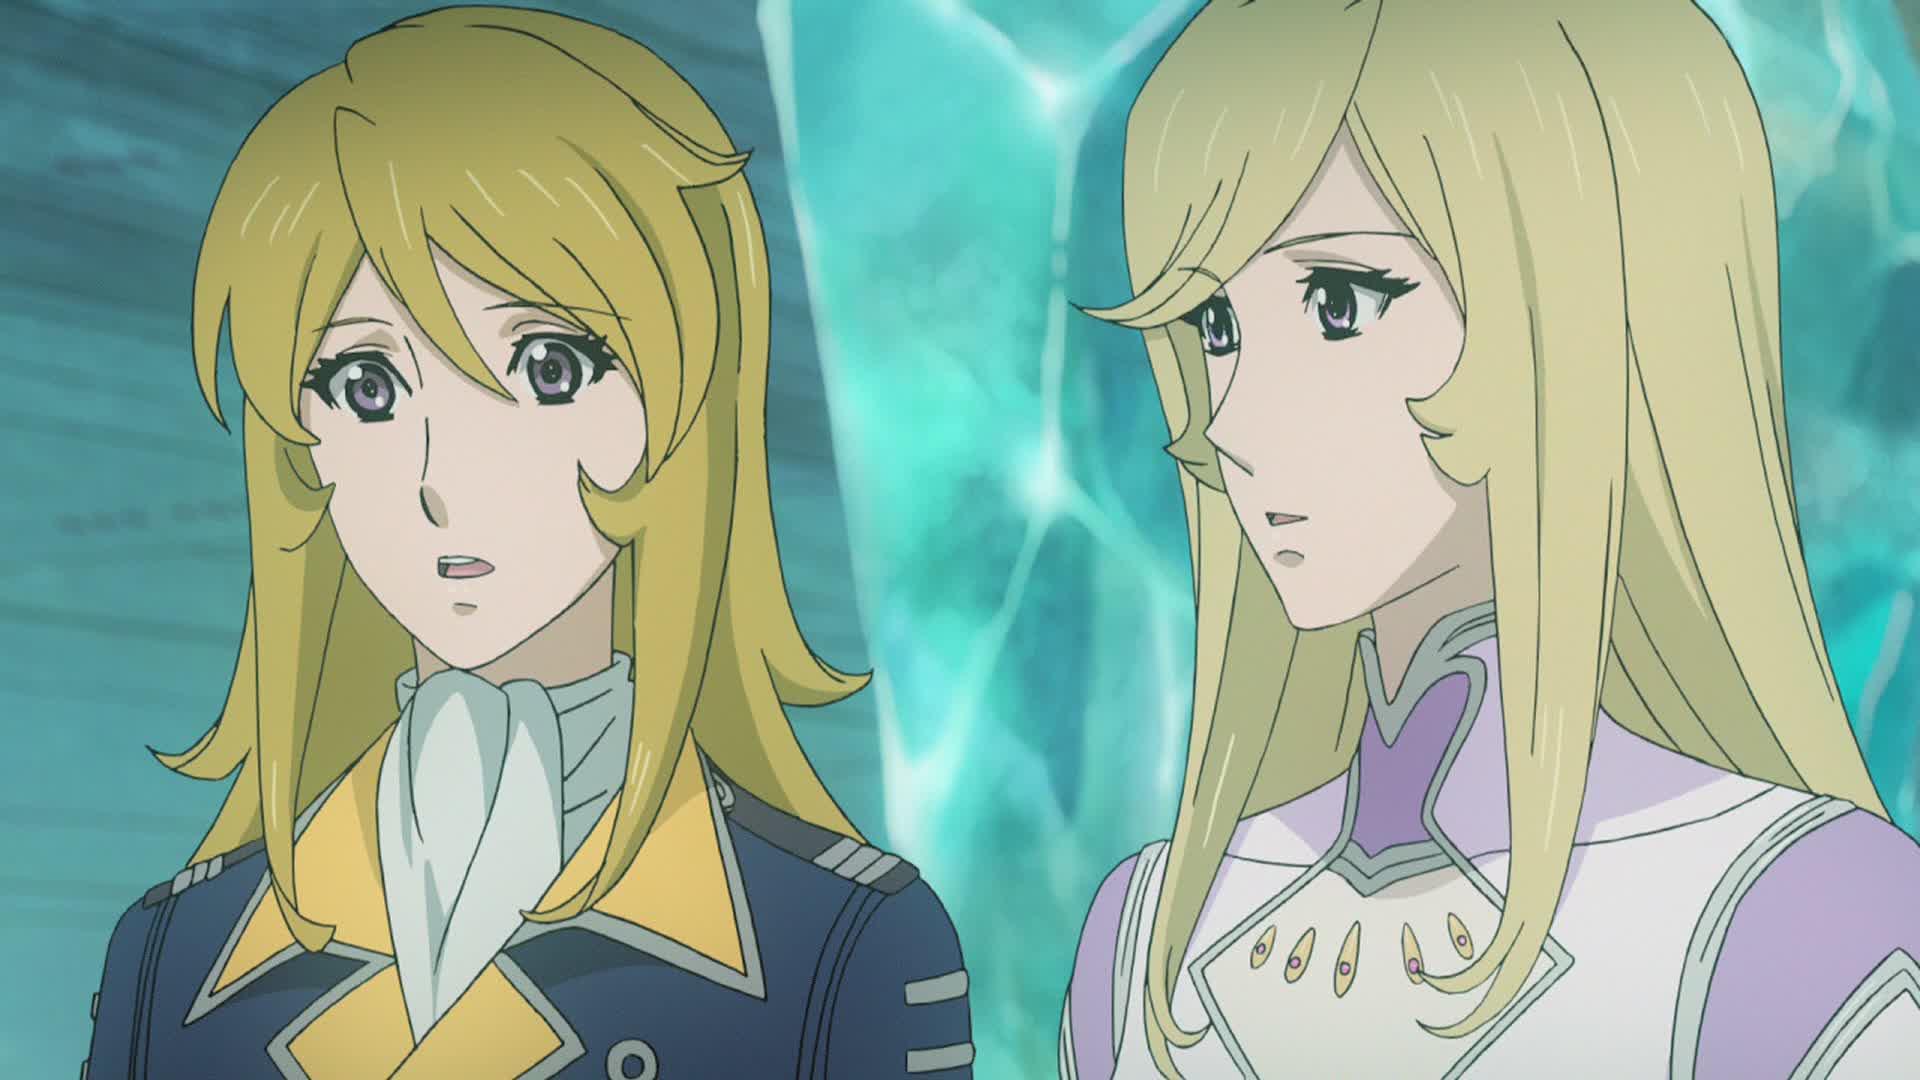 Wallpaper Space Battleship Yamato 2199 Iscandar Sasha Anime